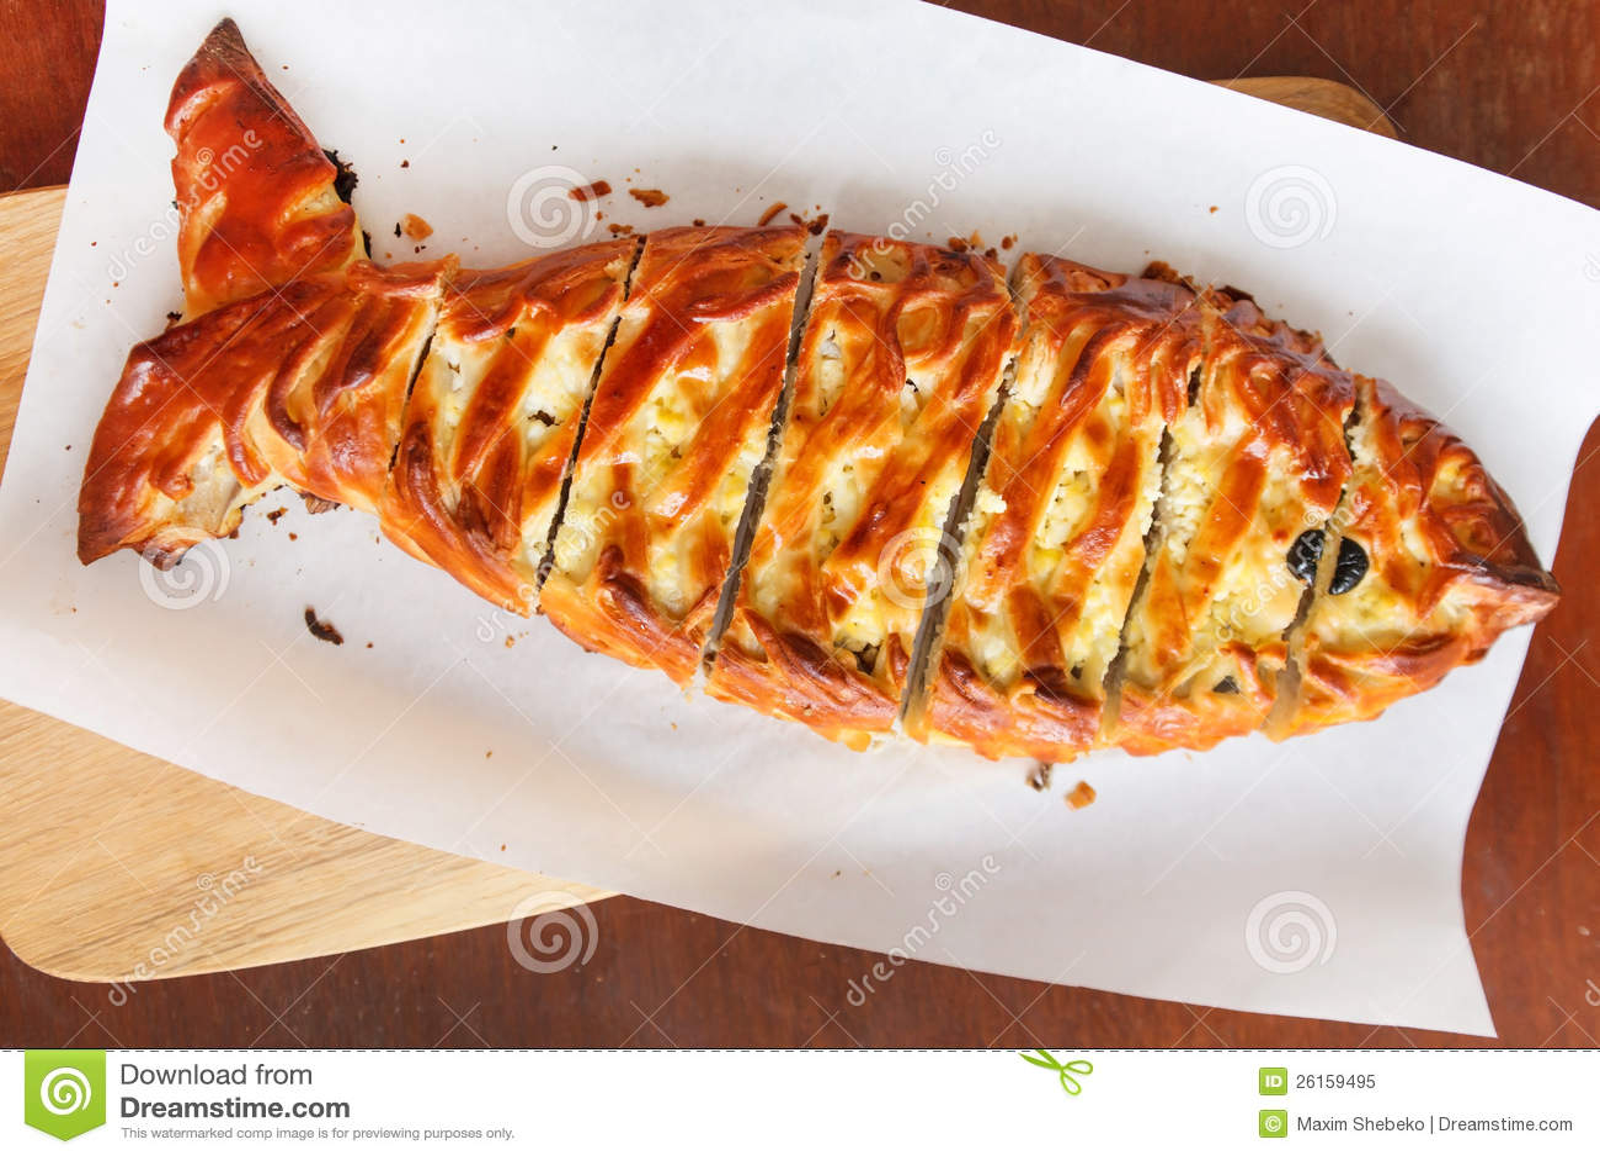 Fish Pie Royalty Free Stock Photo - Image: 26159495